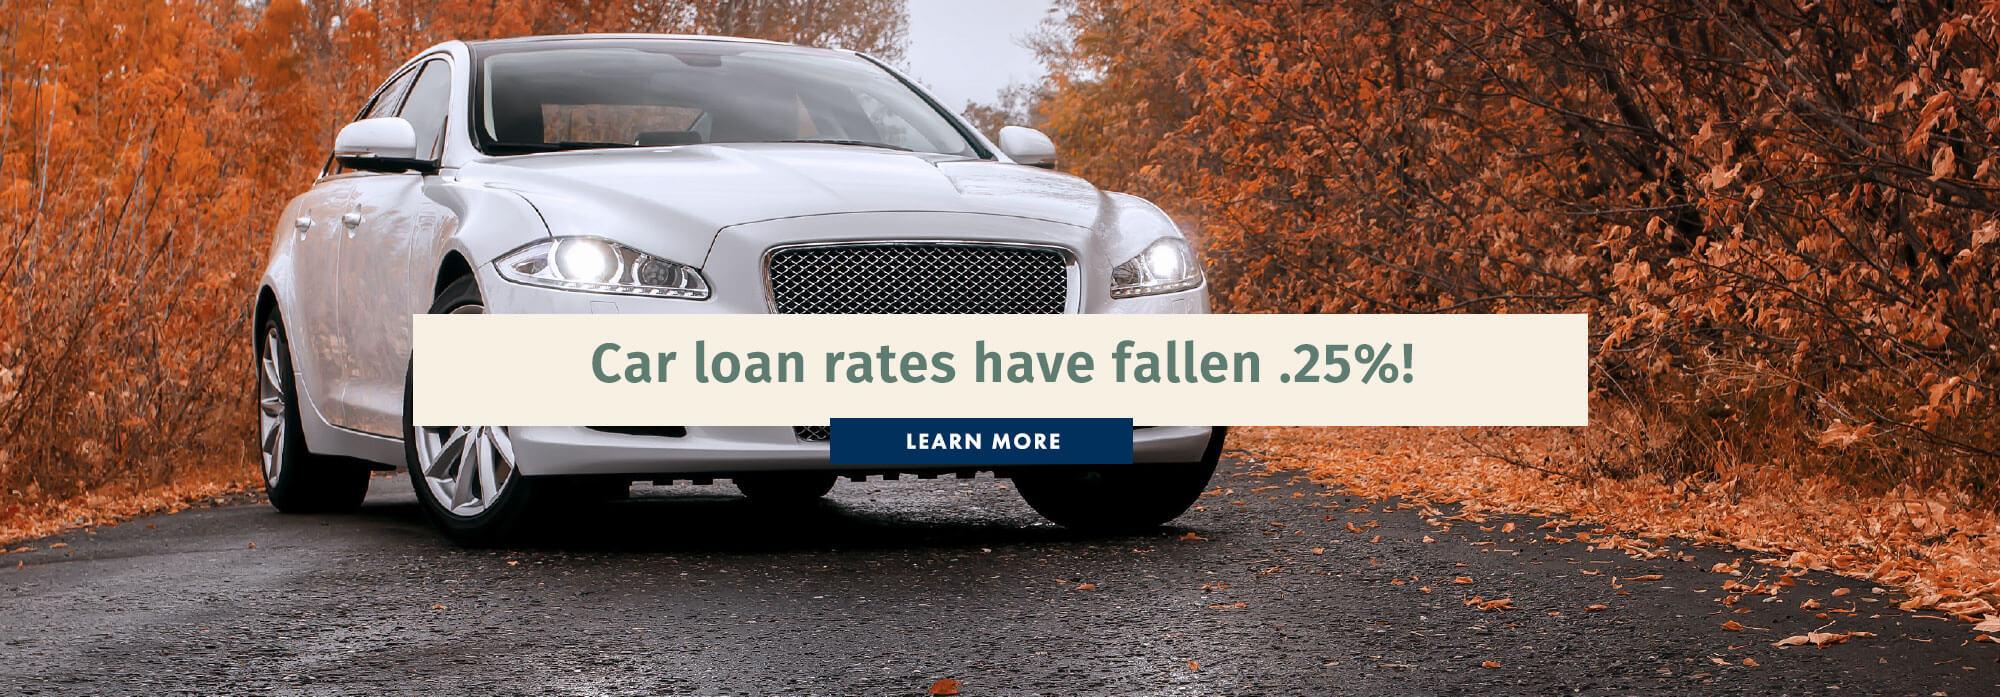 Car loan rates have fallen .25%!